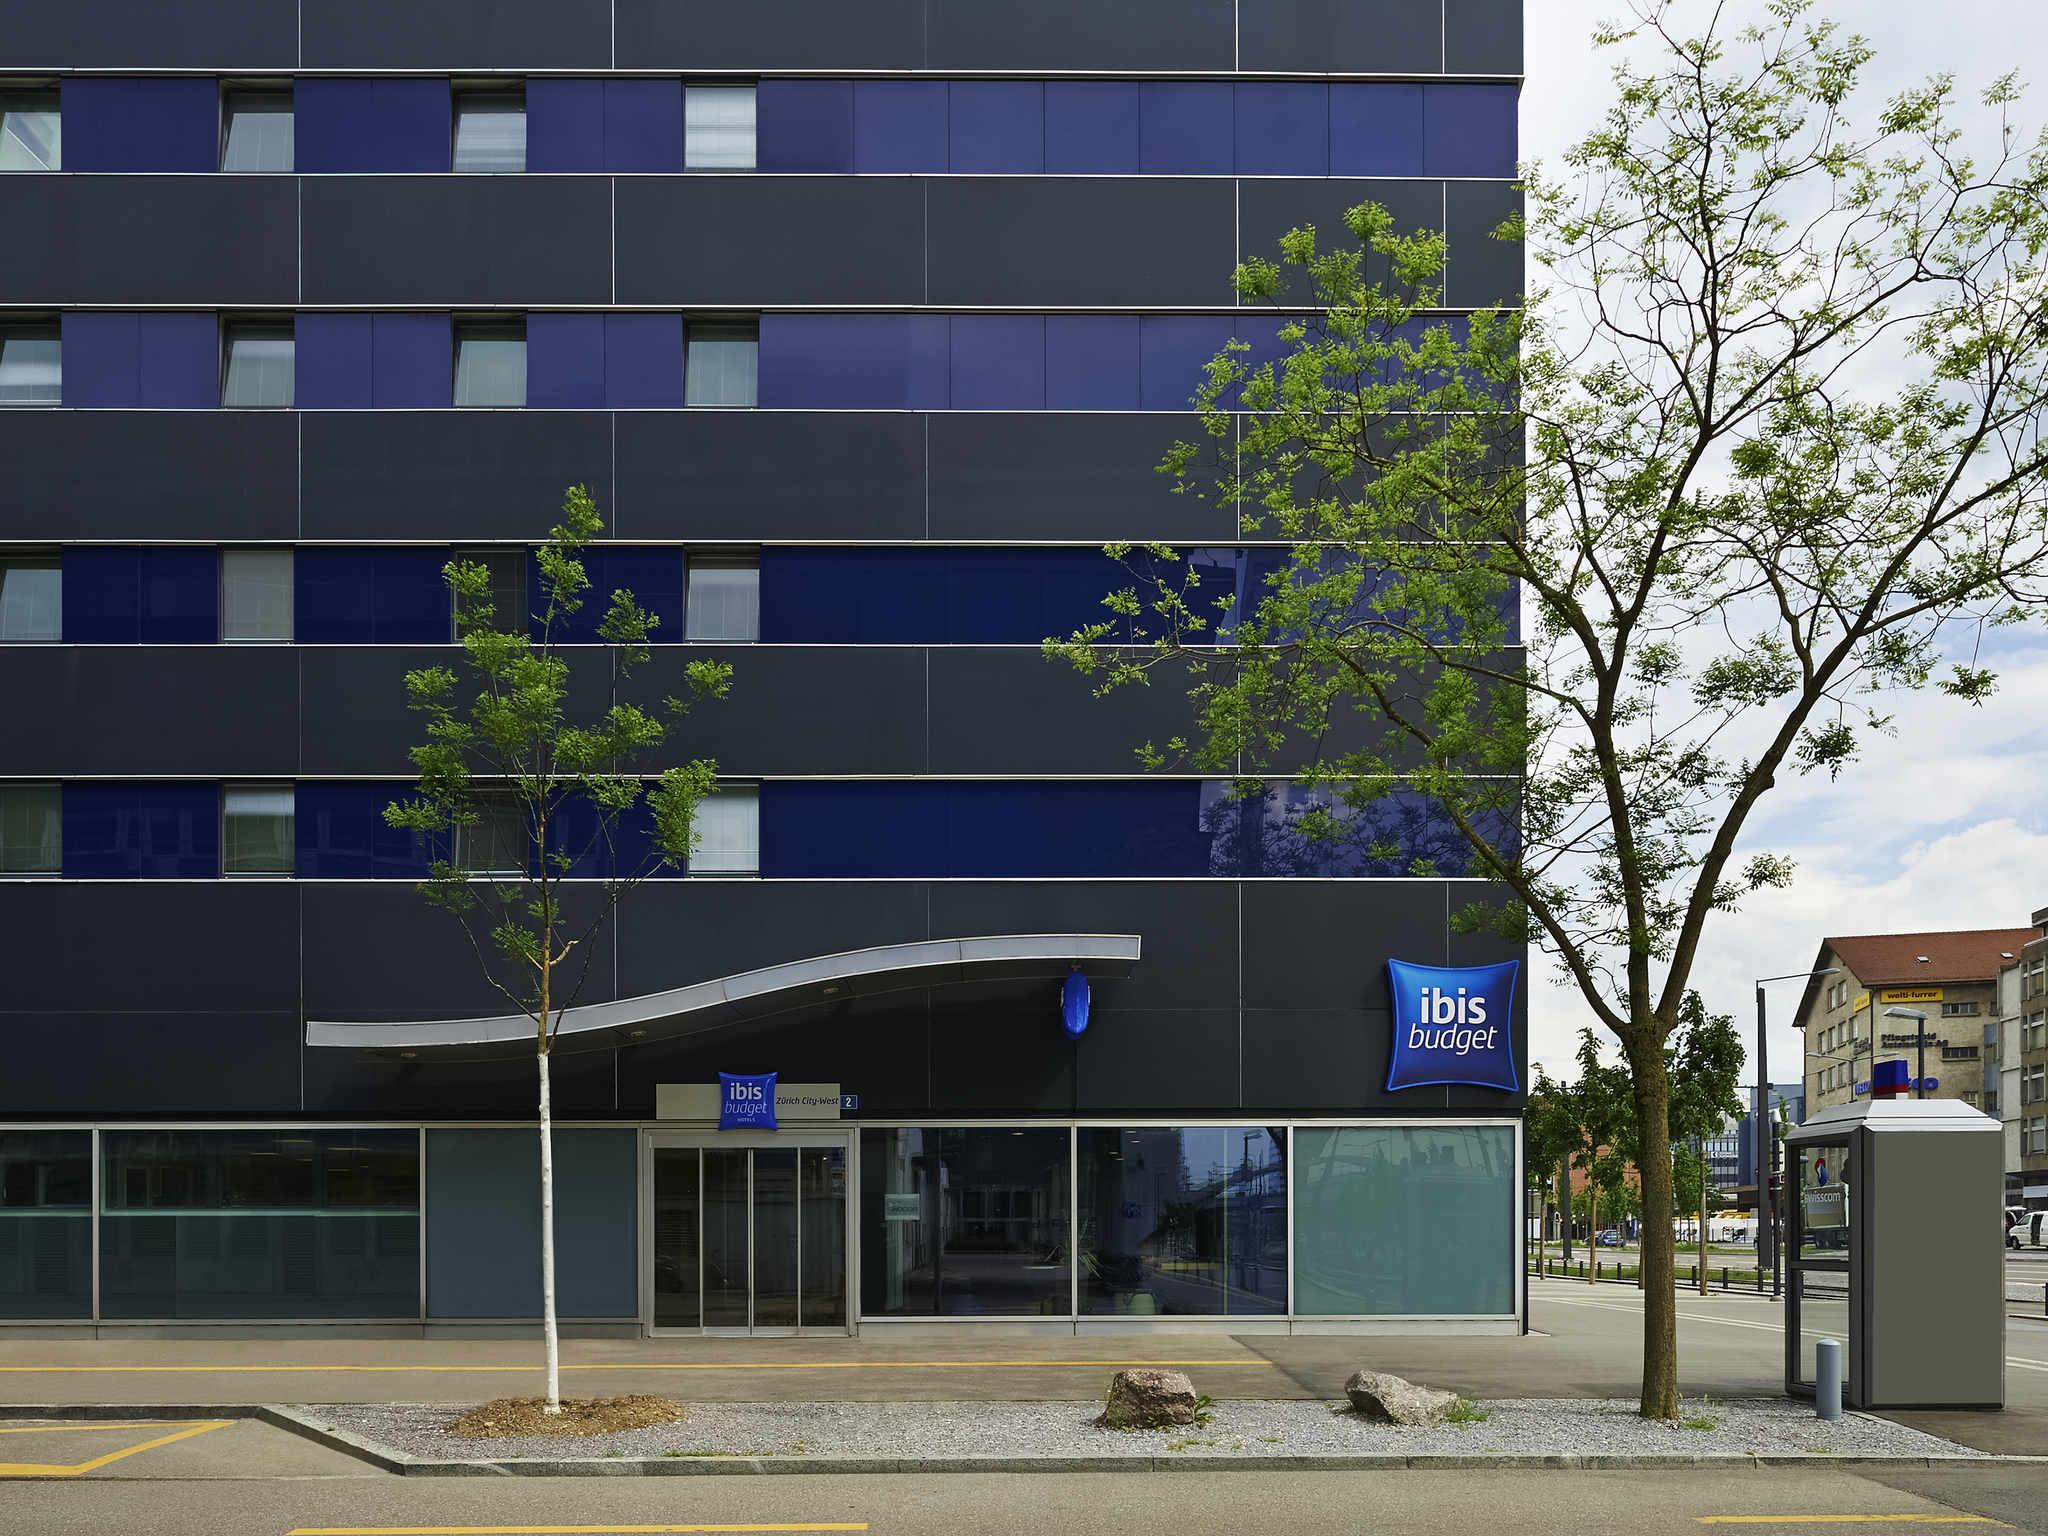 فندق - إيبيس بدجت ibis budget زيورخ سيتي ويست